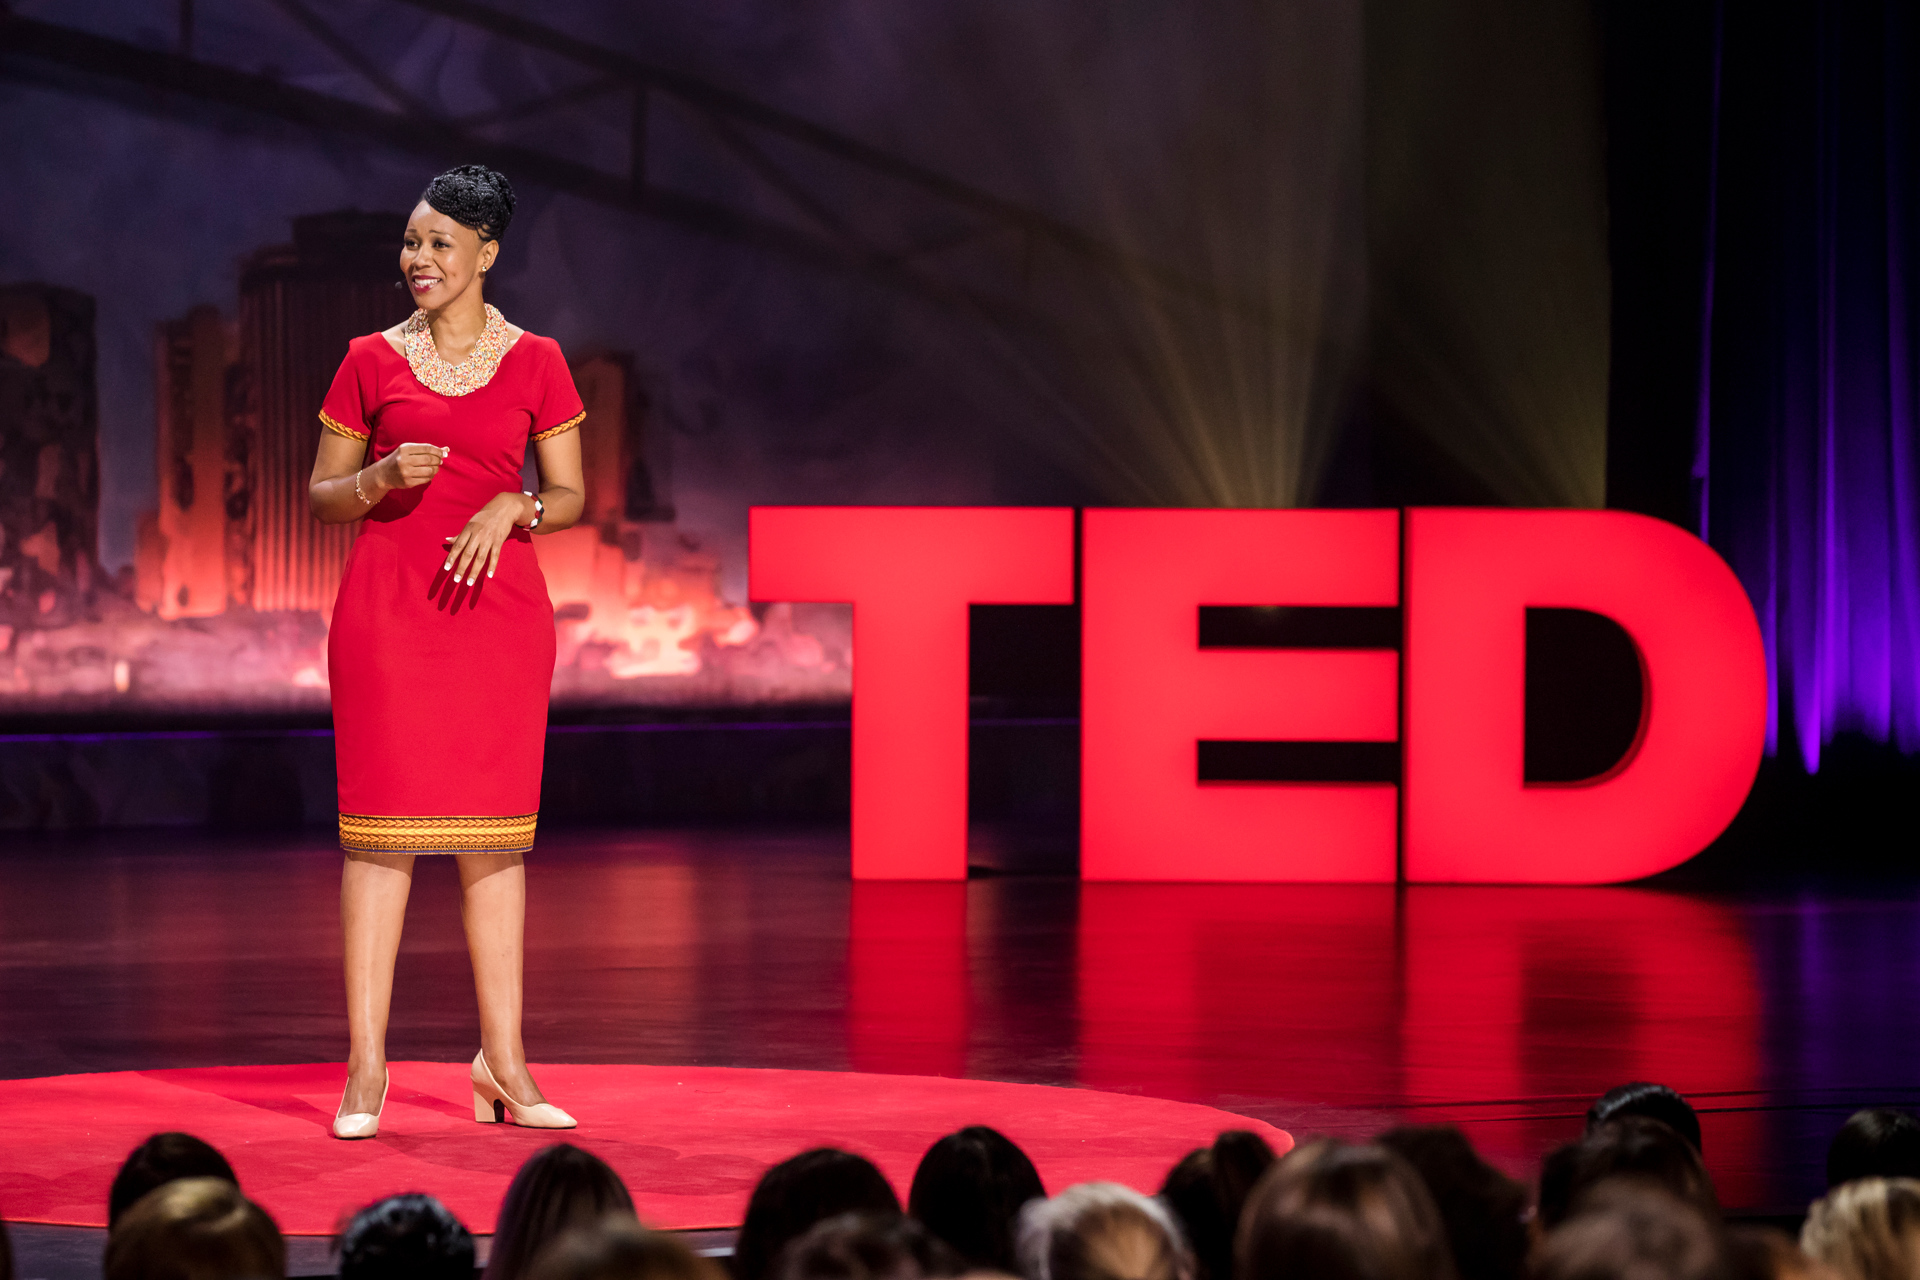 Teresa Njoroge (  Clean Start  ) speaks at TEDWomen 2017 — Bridges, November 1-3, 2017, Orpheum Theatre, New Orleans, Louisiana. Photo: Stacie McChesney / TED